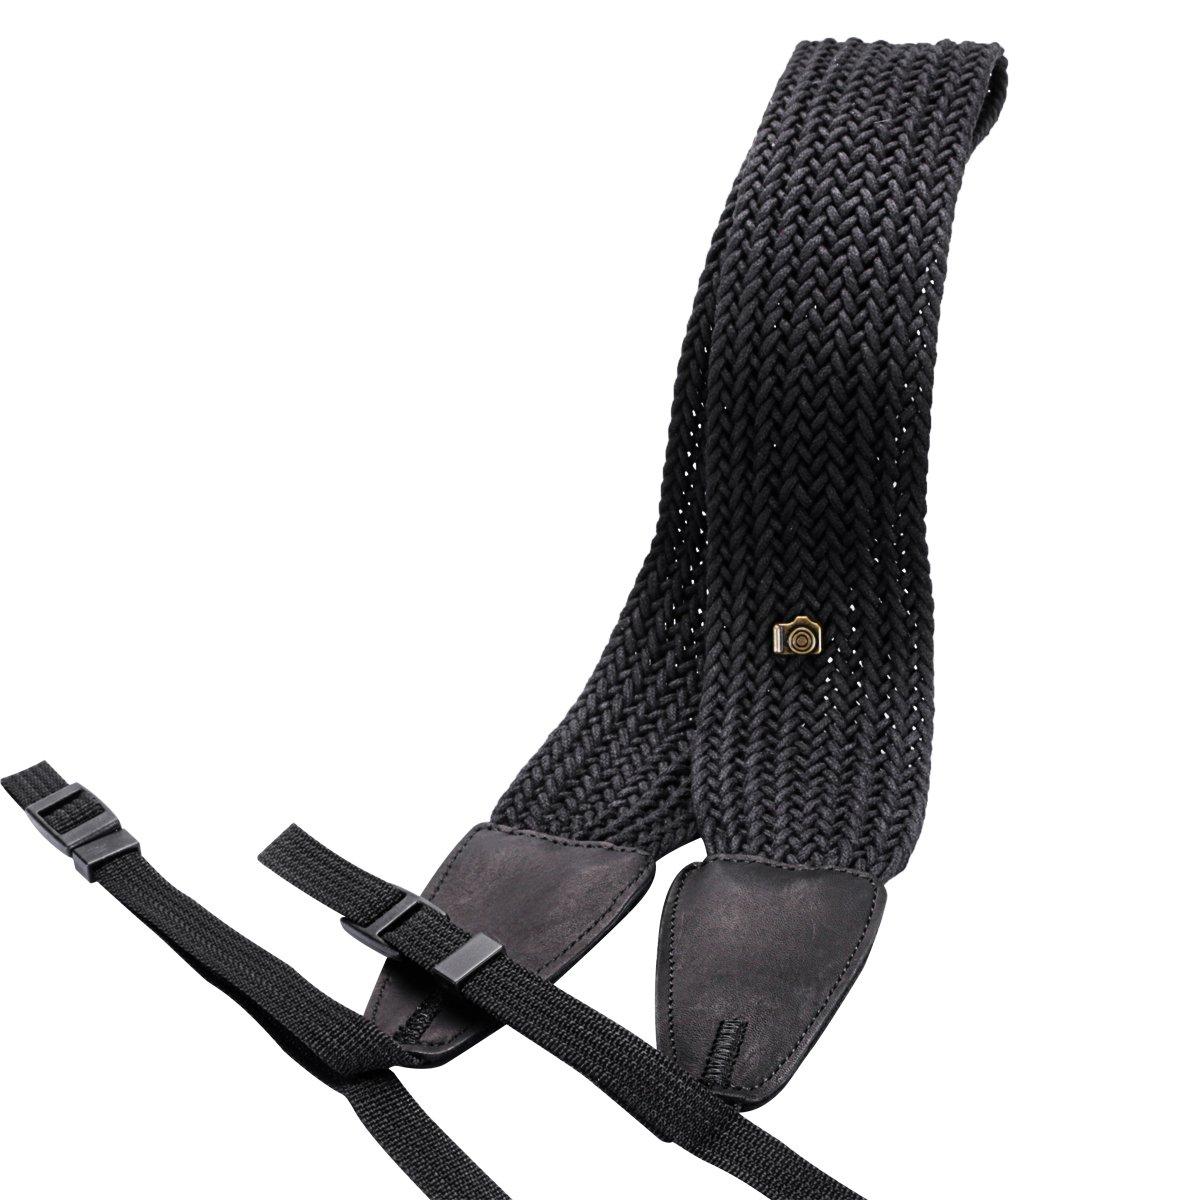 Eggsnow Camera Shoulder Neck Strap Knit Broaden Universal Camera Belt Strap for Women Men All DSLR SLR Nikon Canon Sony Olympus Pentax Samsung-Black